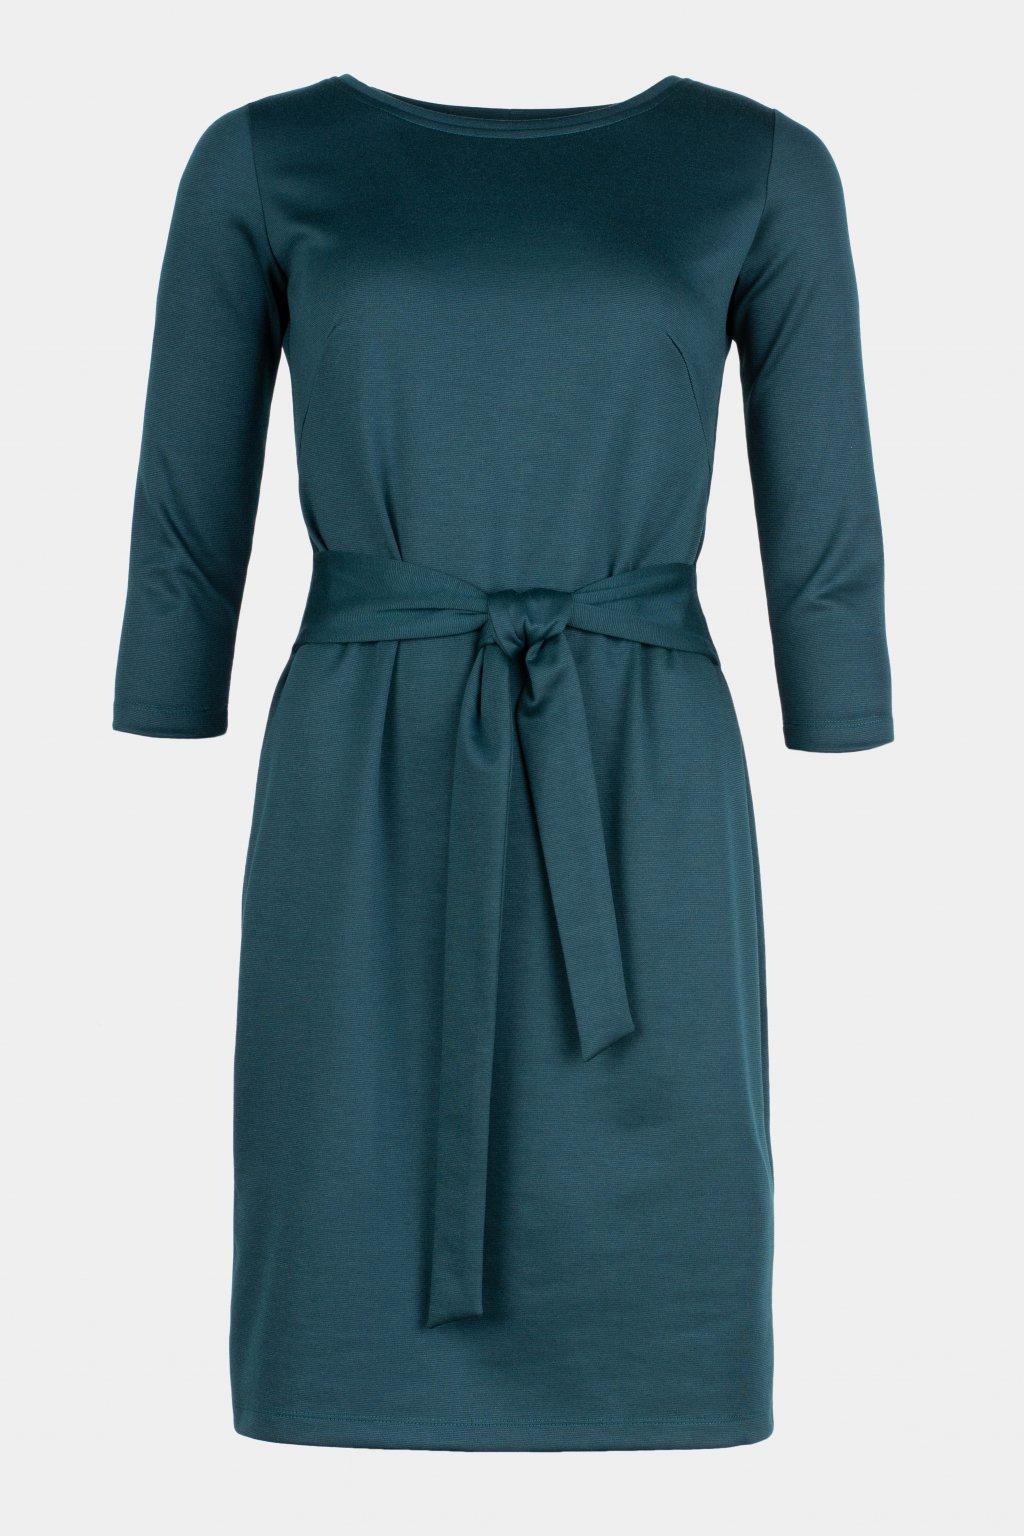 Šaty zelené 31034